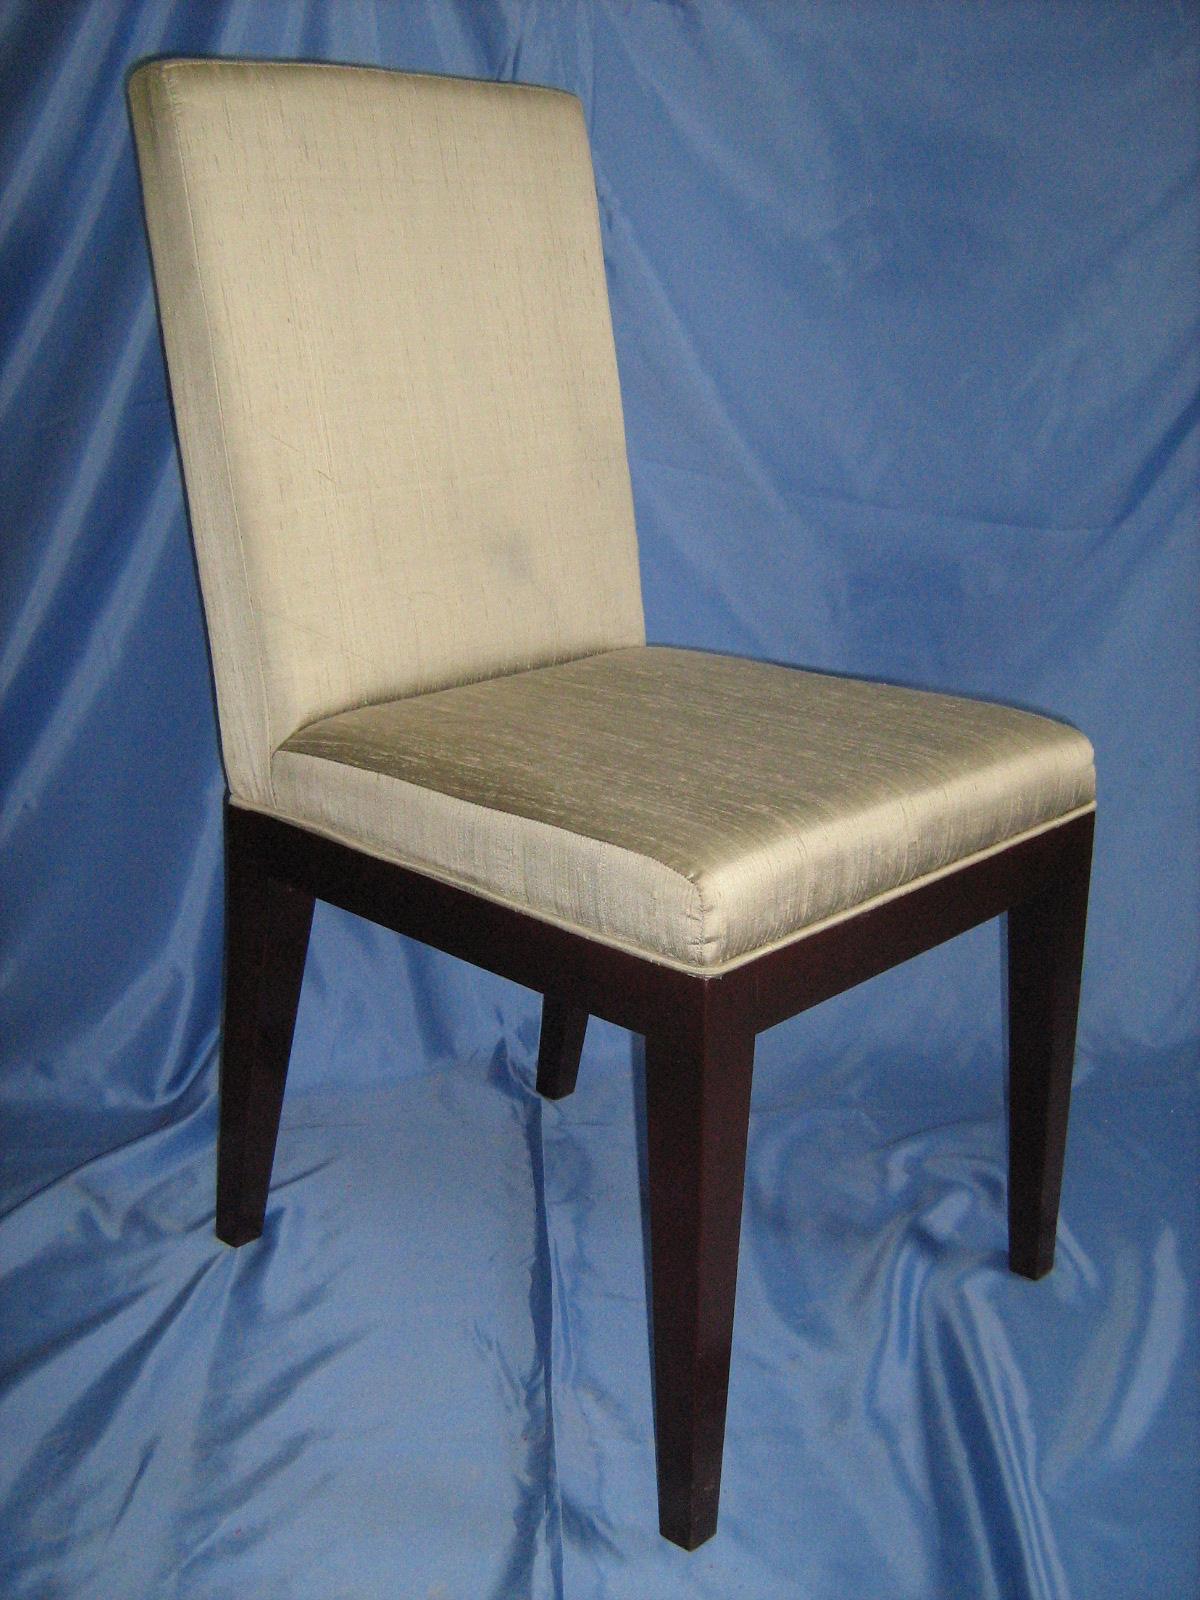 Cadeira e Mesa: Cadeiras de Madeira para Sala de Jantar #30496F 1200x1600